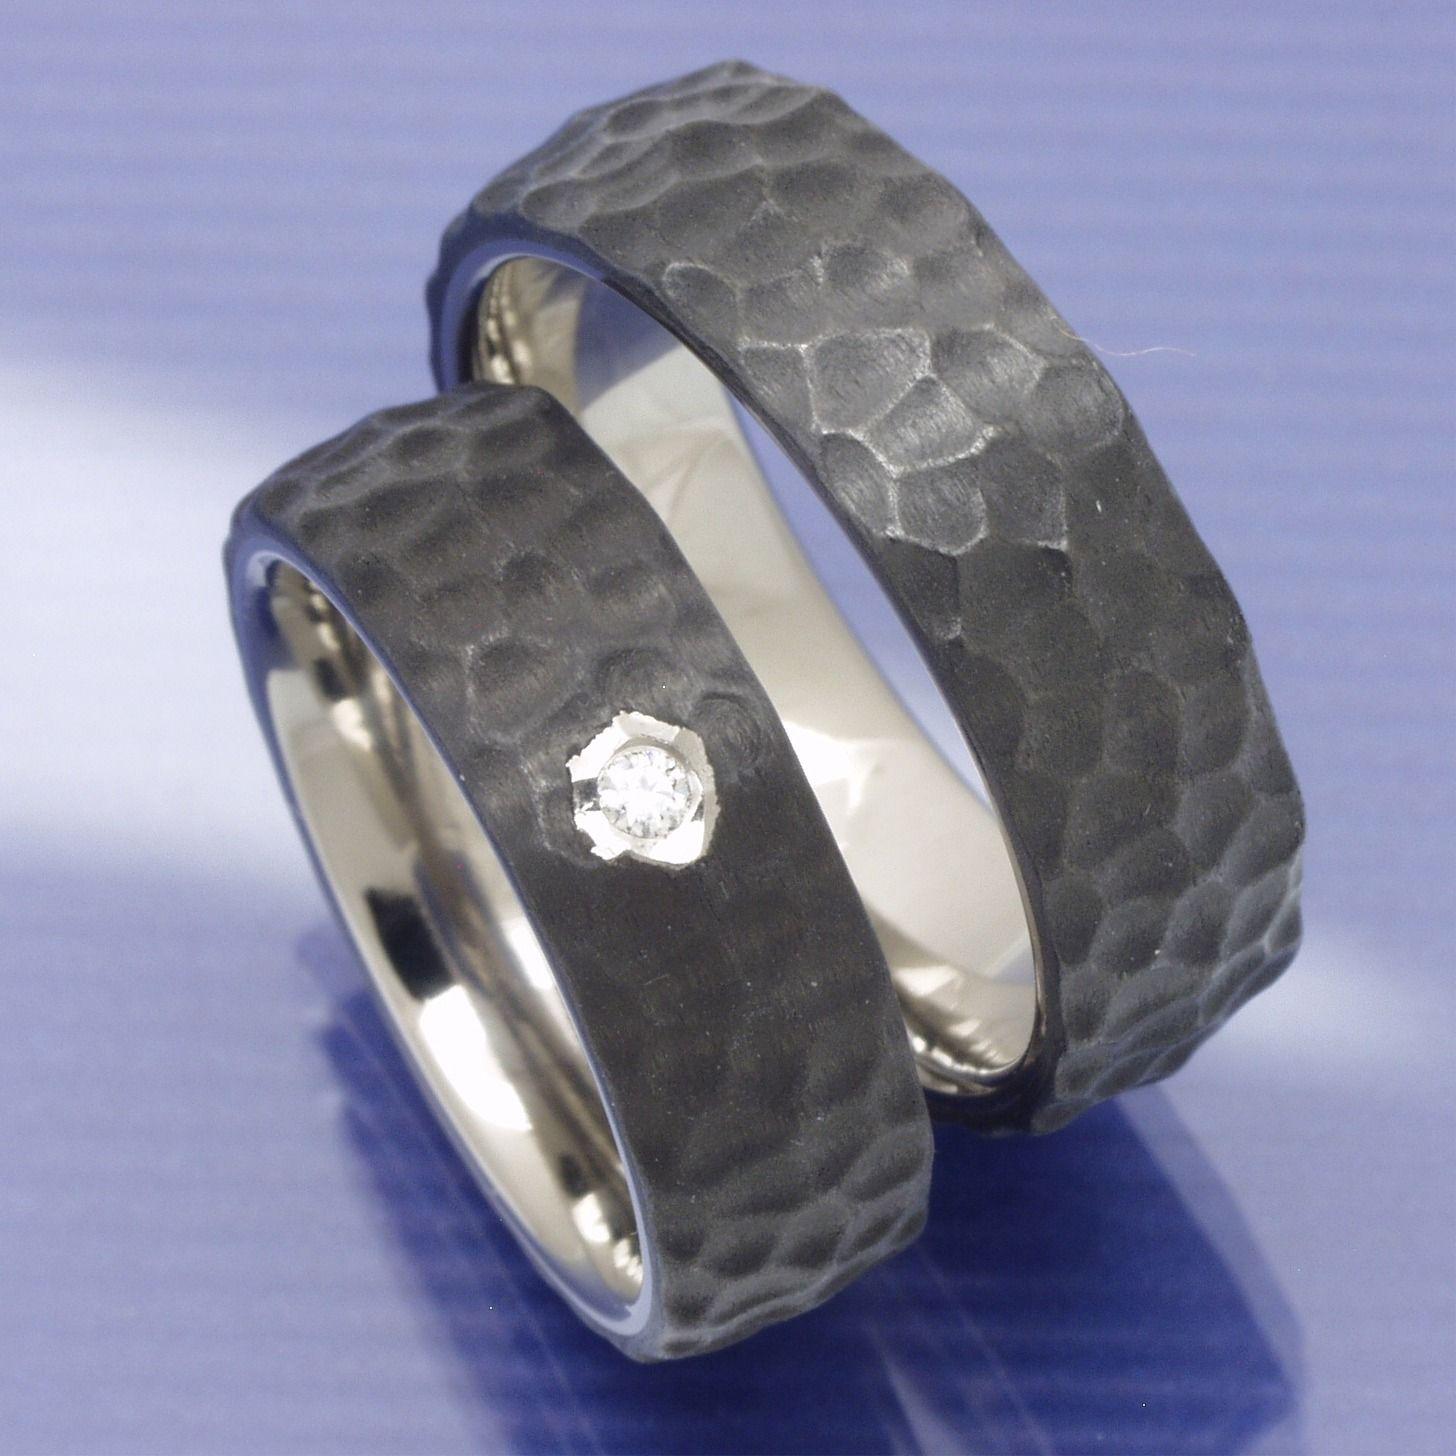 Partnerringe titan breit  Titan Carbon Trauringe P8012467 | Trauringe Titan Carbon ...